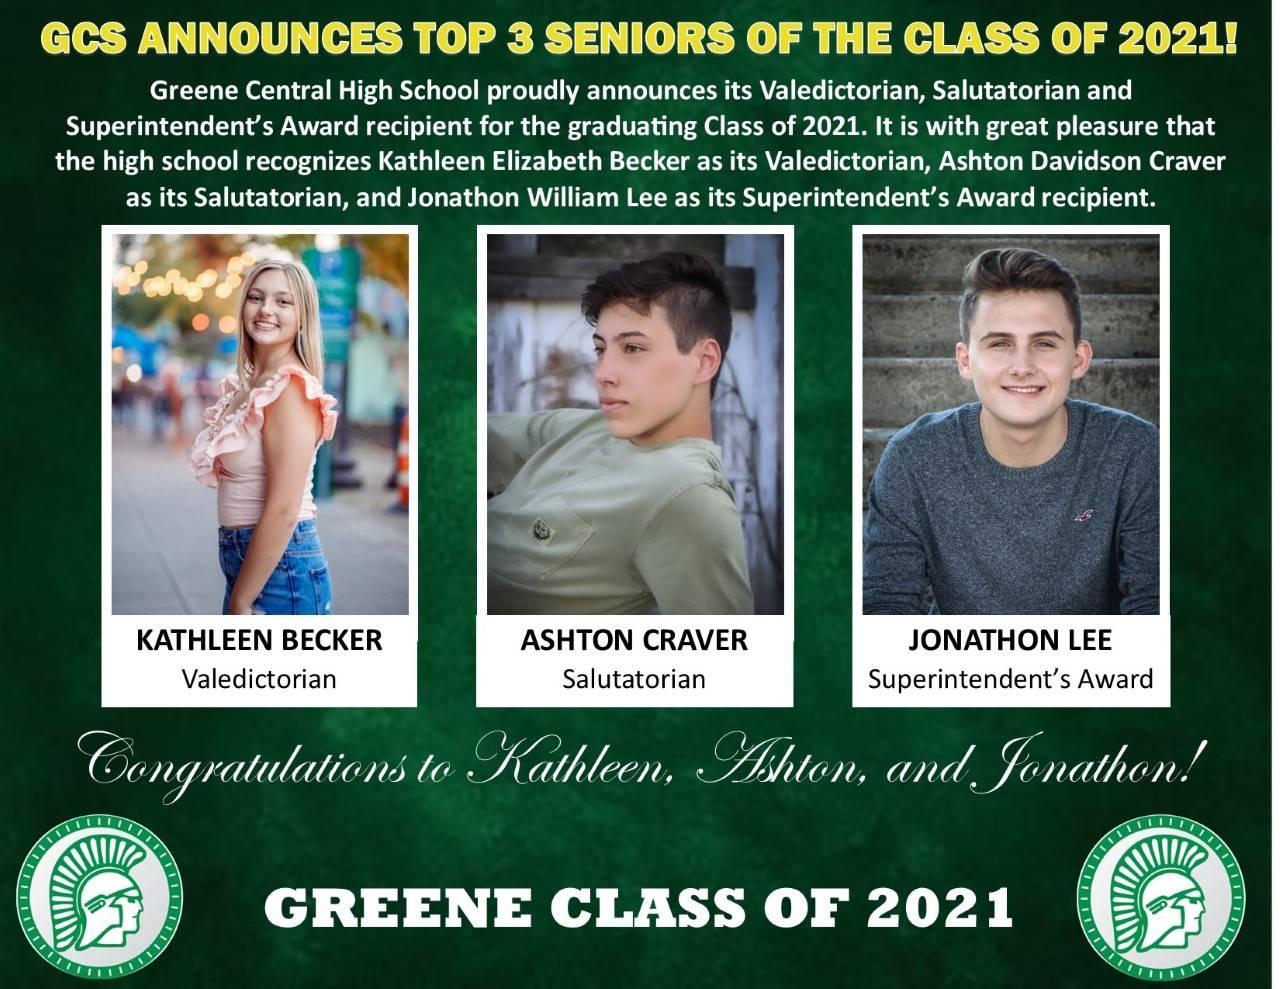 Top 3 Seniors Bios and pics